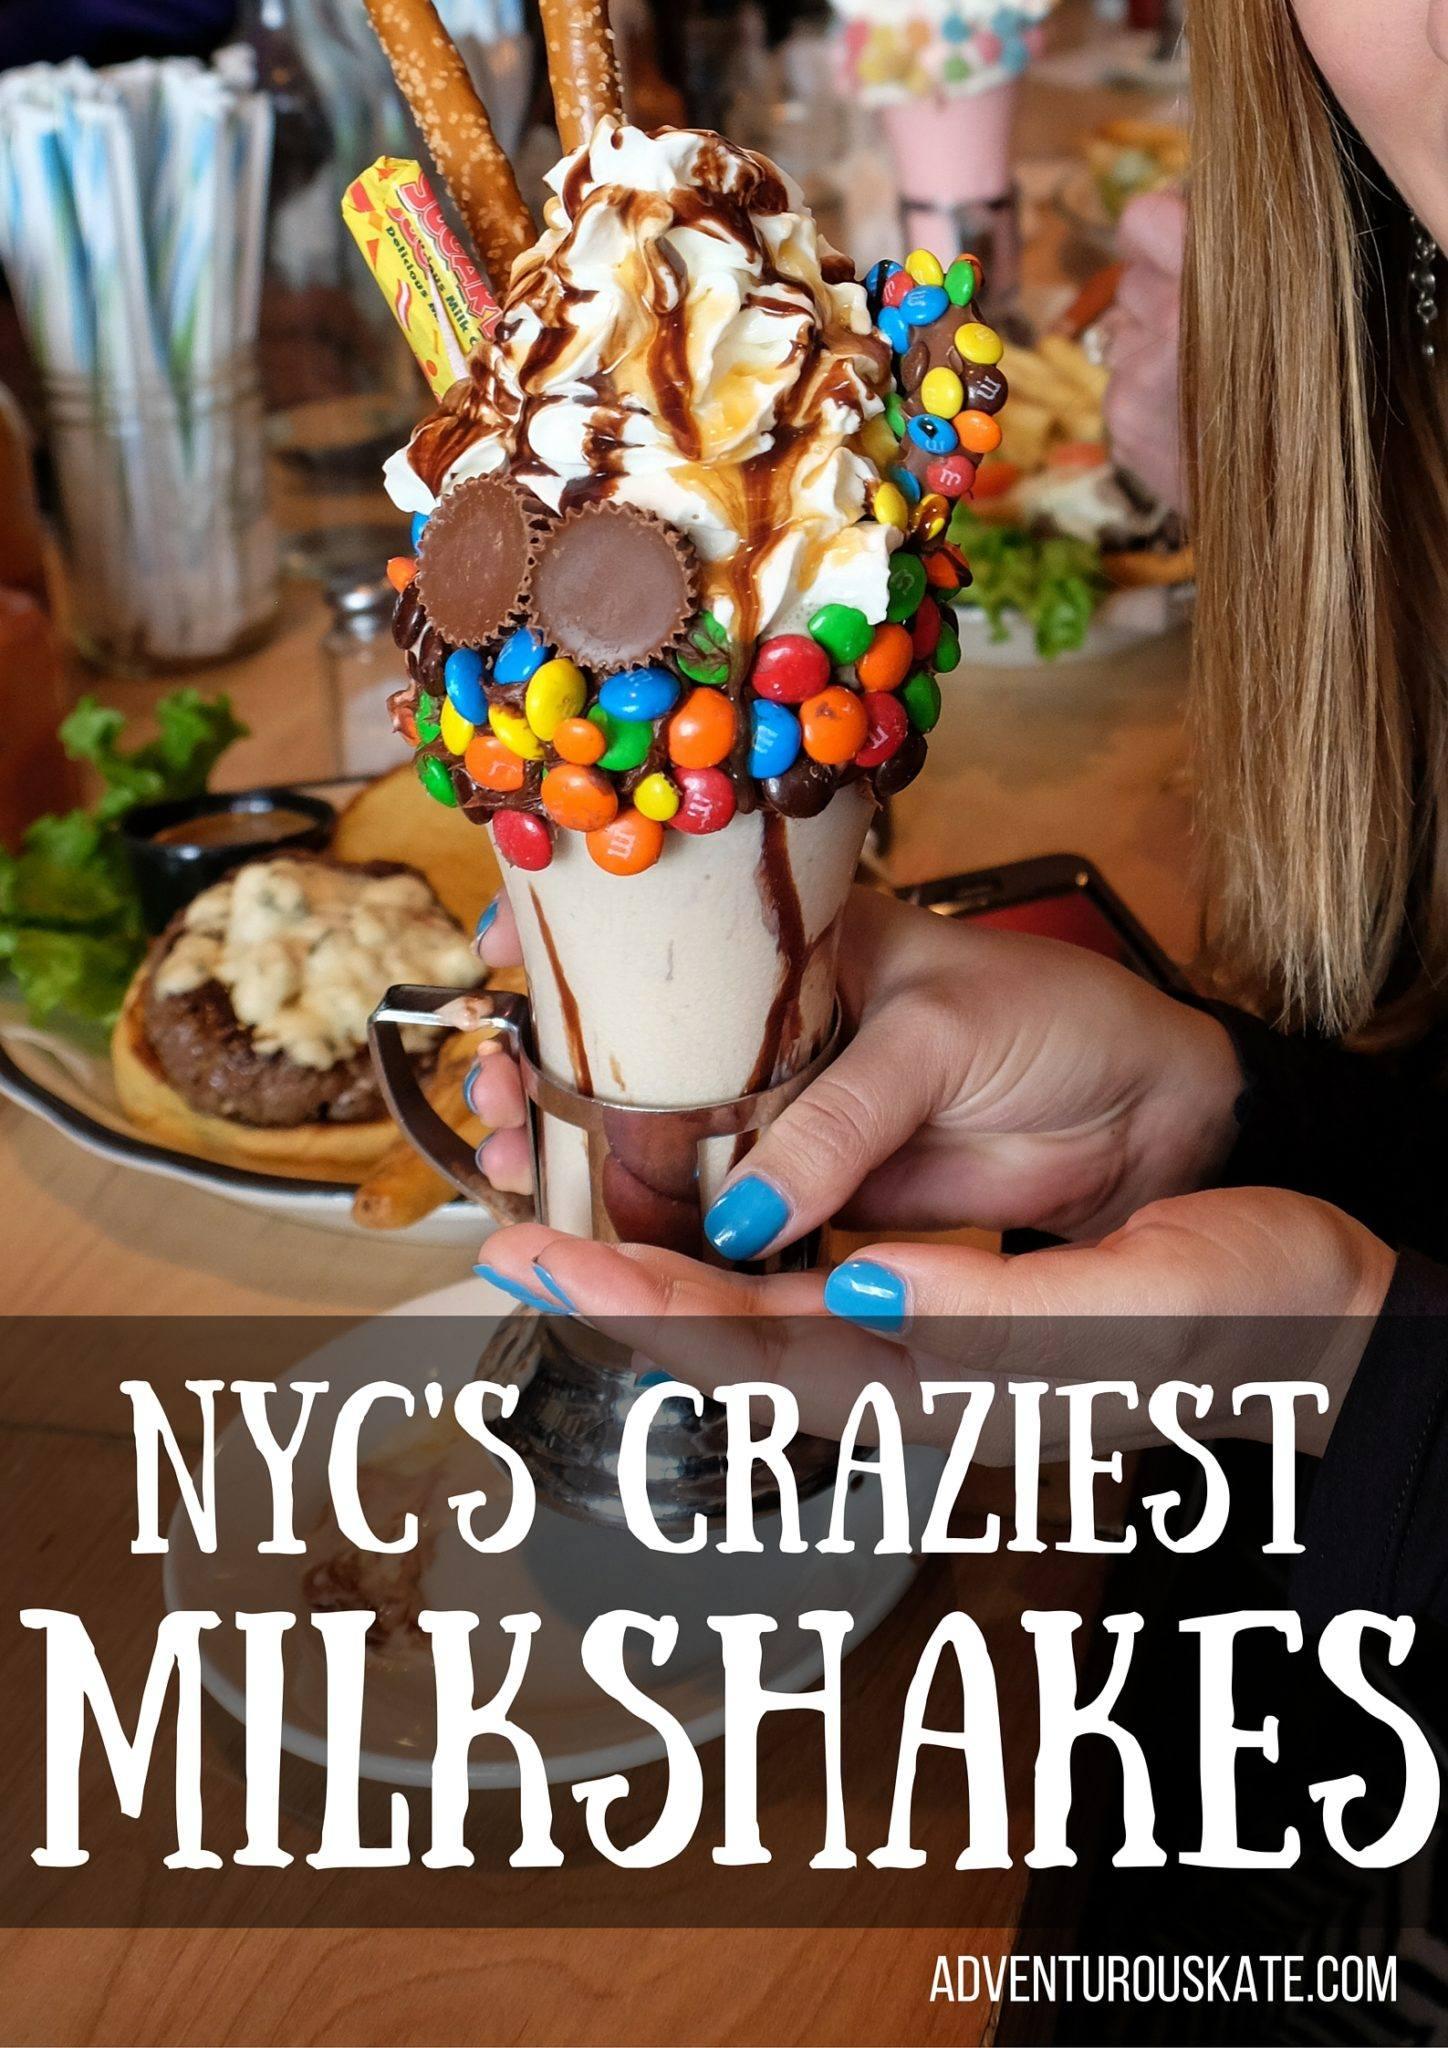 Sightly Se Black Tap Line Craziest Milkshakes New York City Adventurous Milkshake Club Urban Dictionary California Milkshake Urban Dictionary Would You Wait nice food Milkshake Urban Dictionary